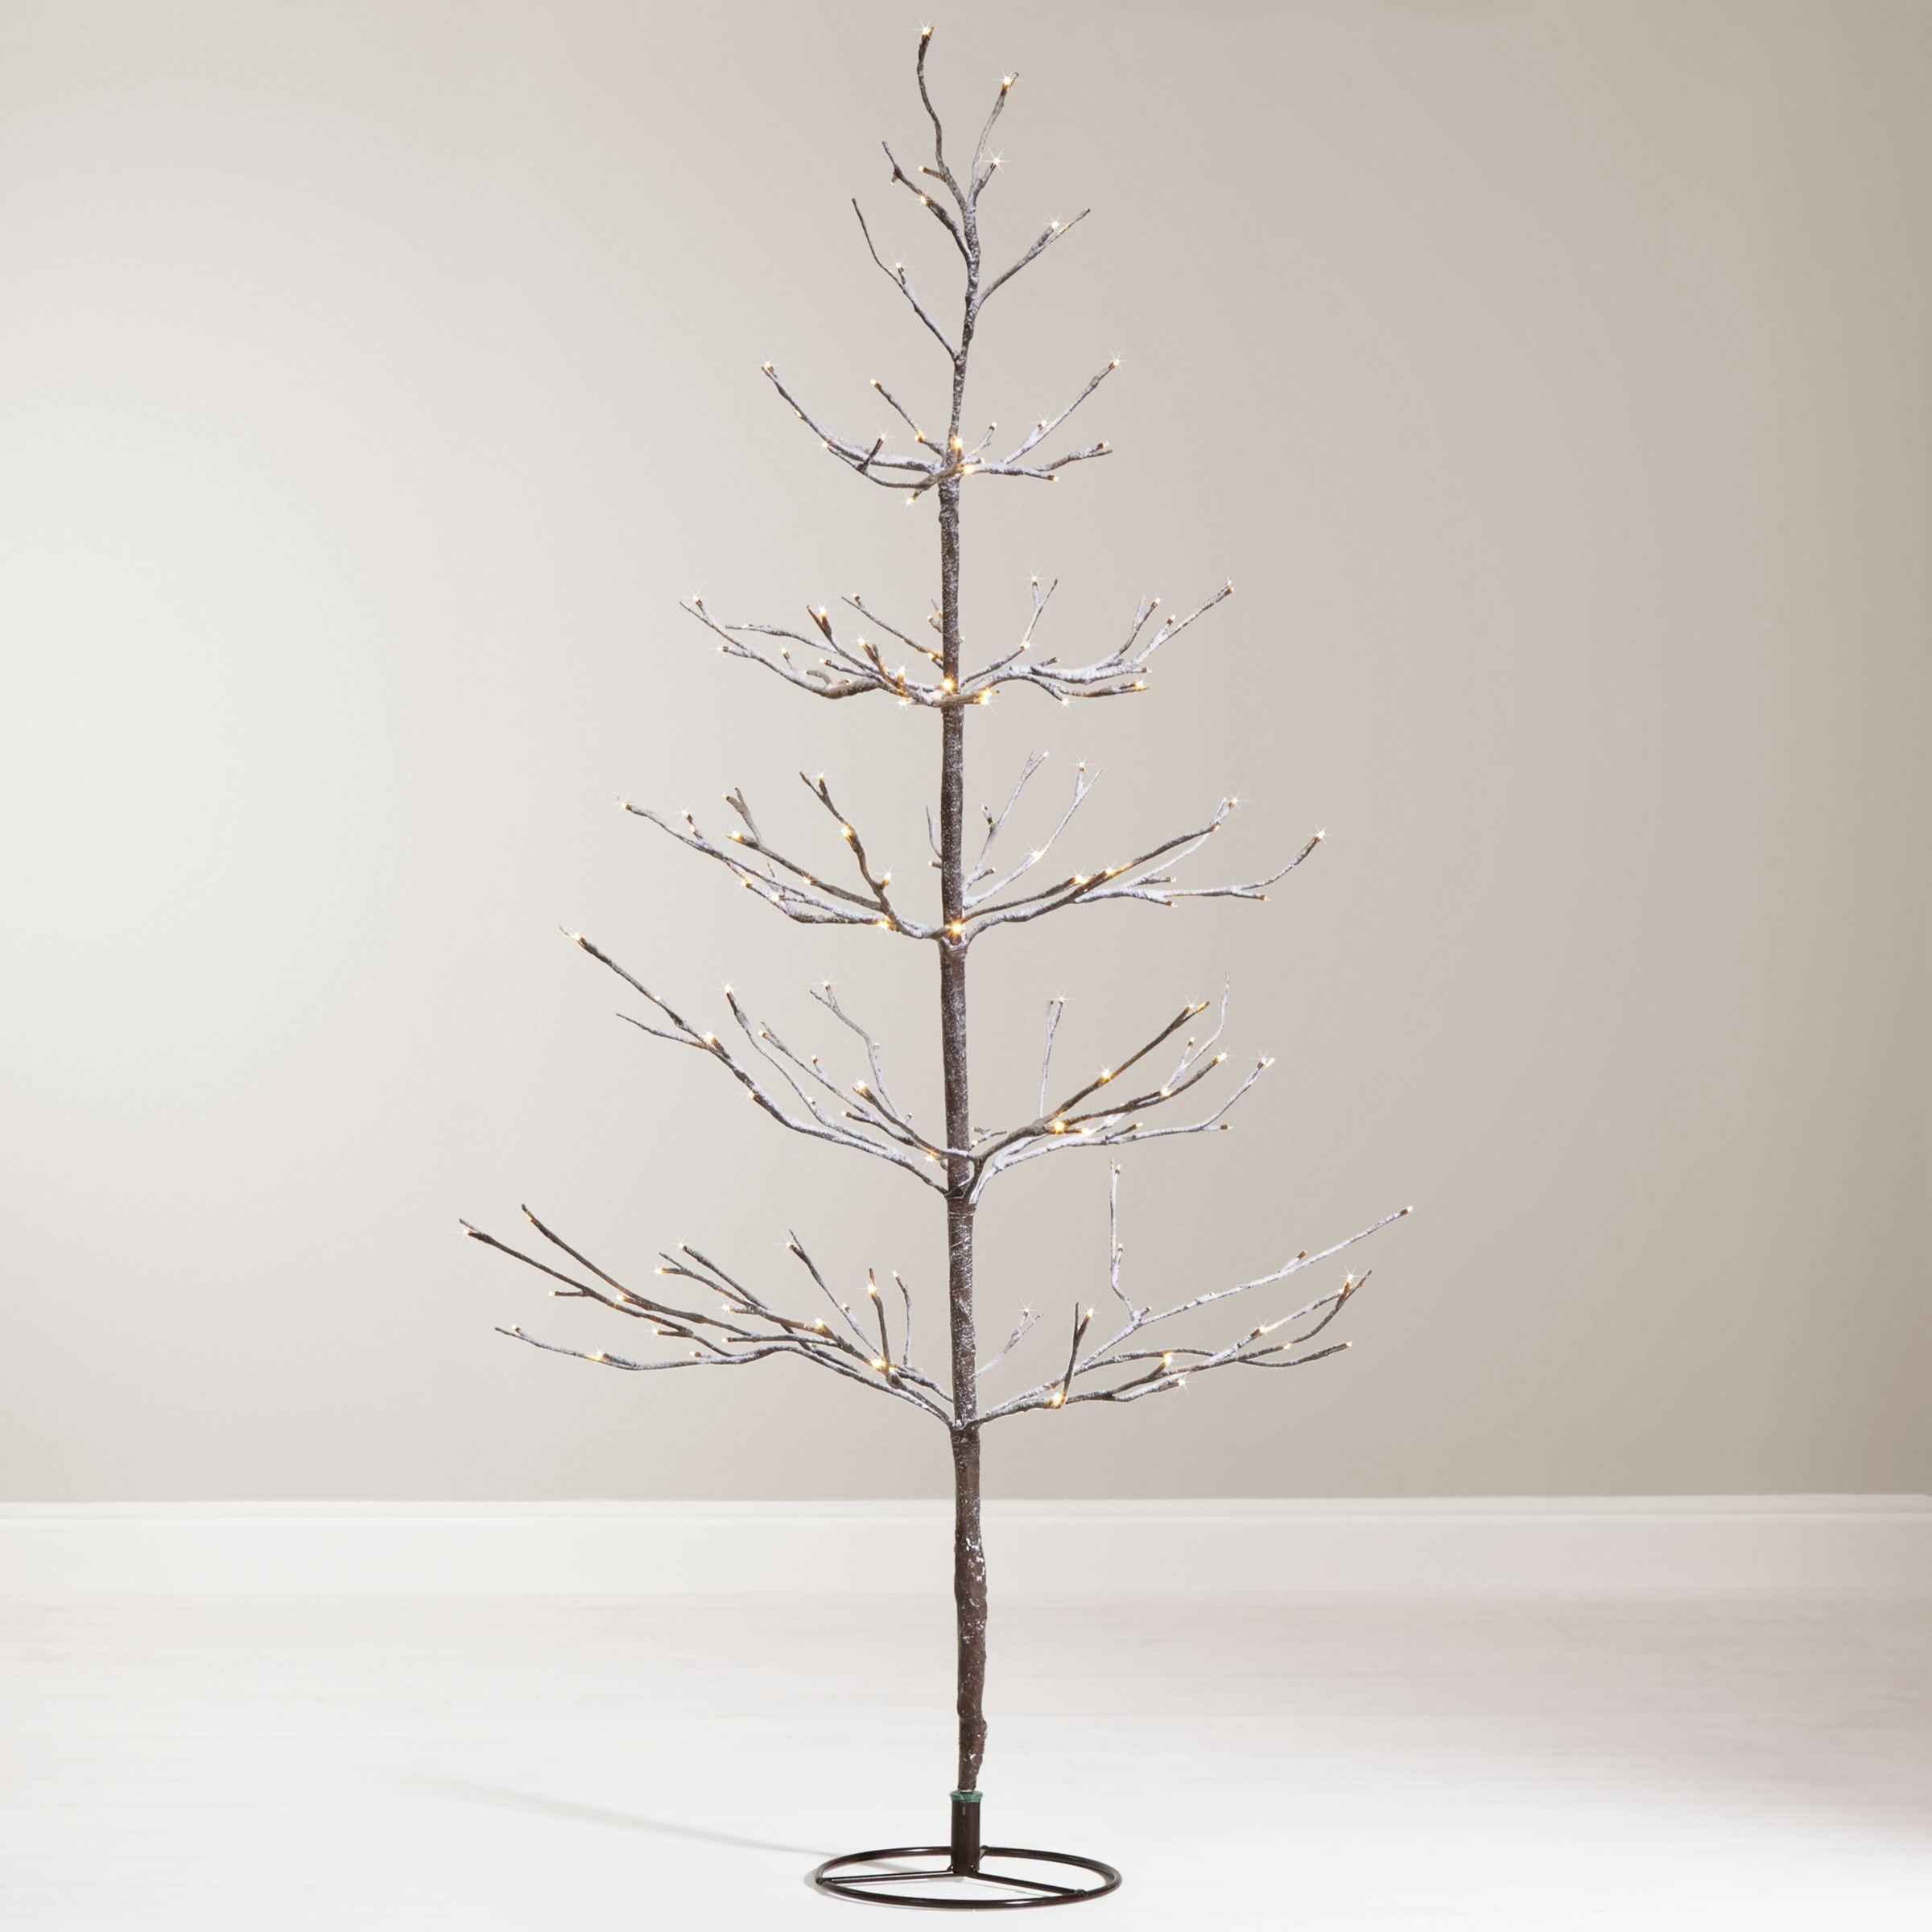 Christmas Branch Tree.John Lewis 4ft Pre Lit Snowy Twig Christmas Tree White At